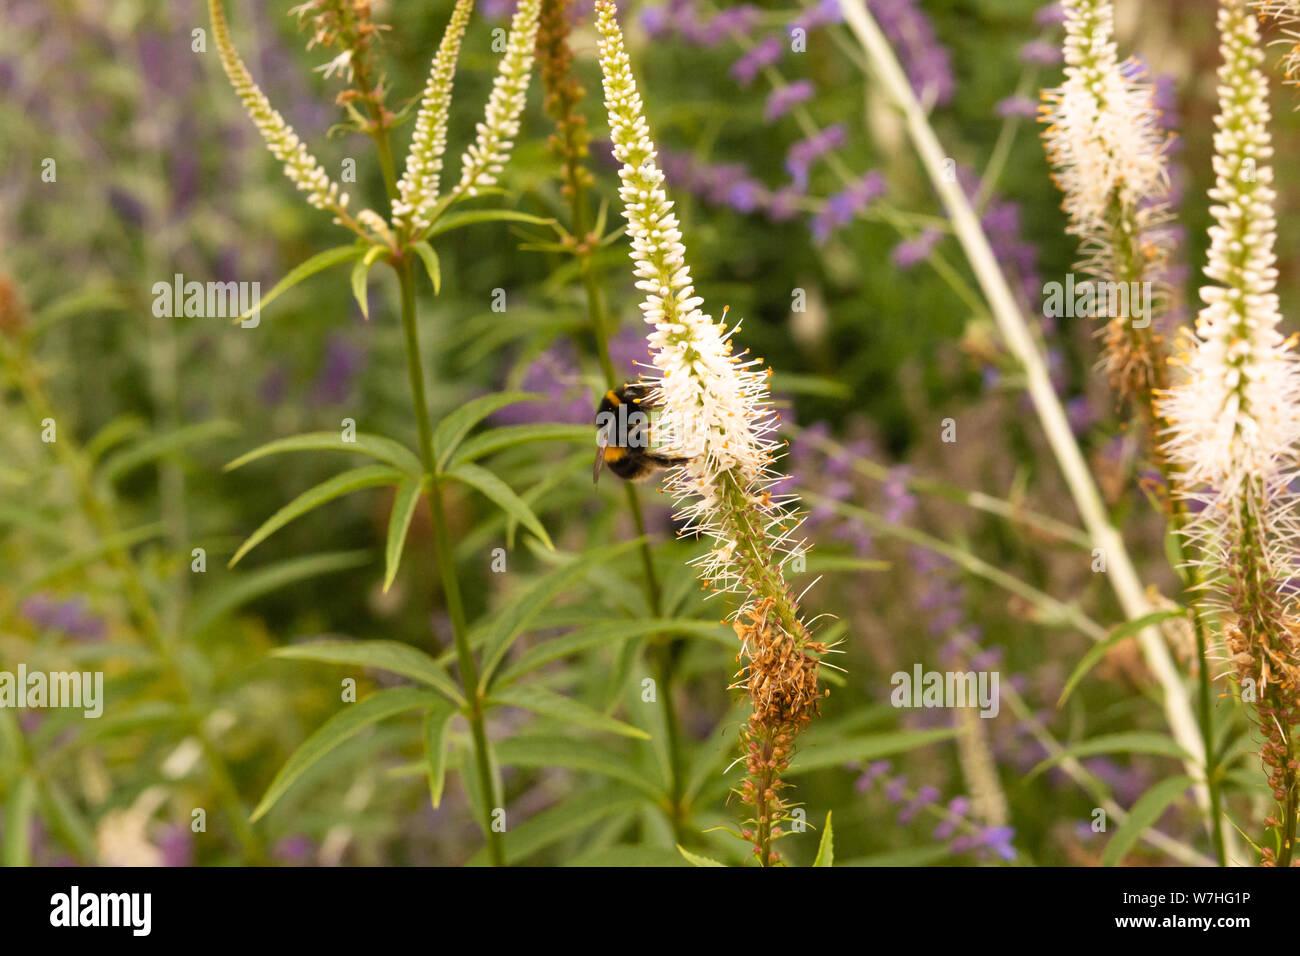 Bumblebee (Rhombus) collecting pollen in a garden Stock Photo